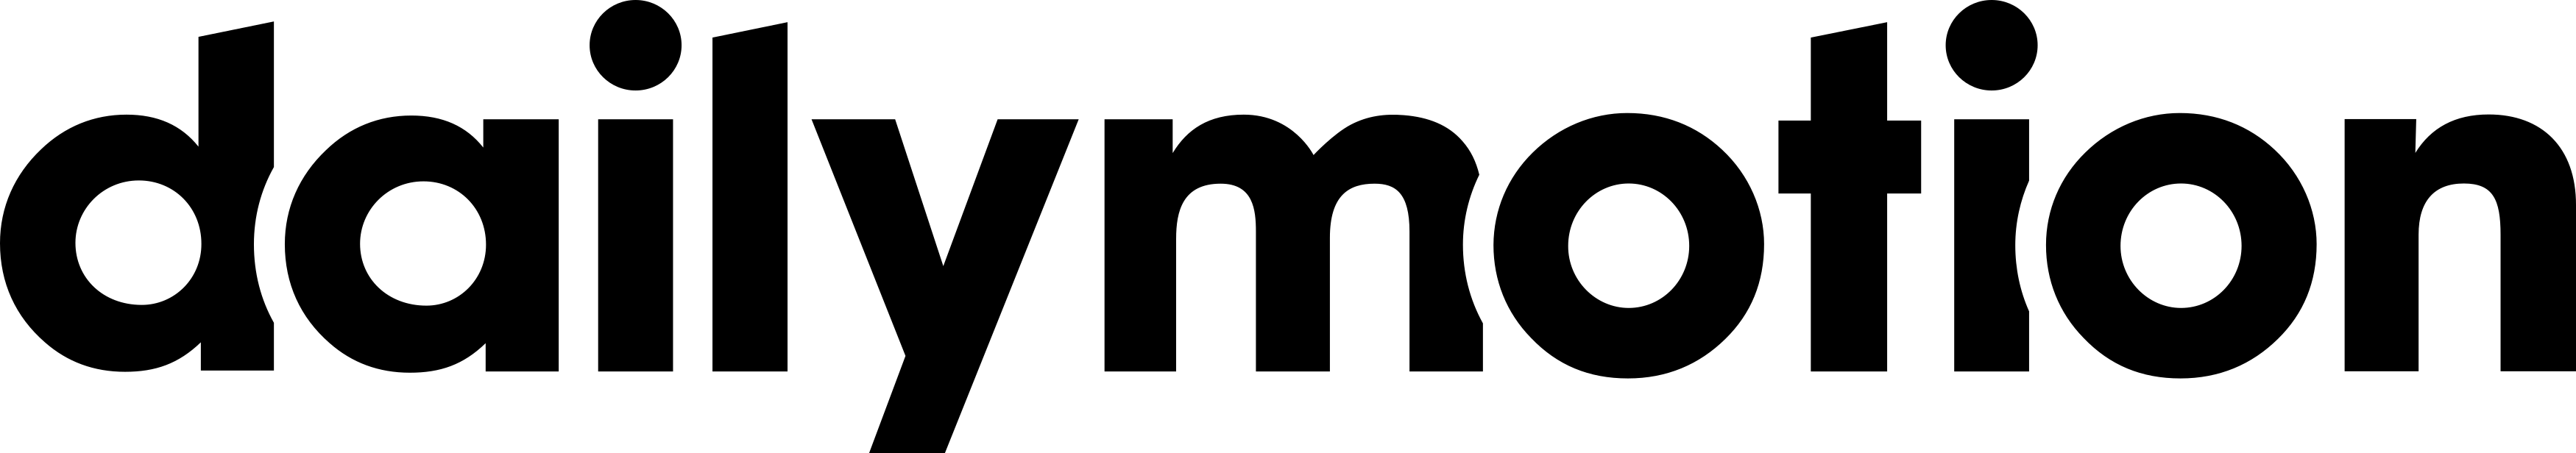 dailymotion-logo-1